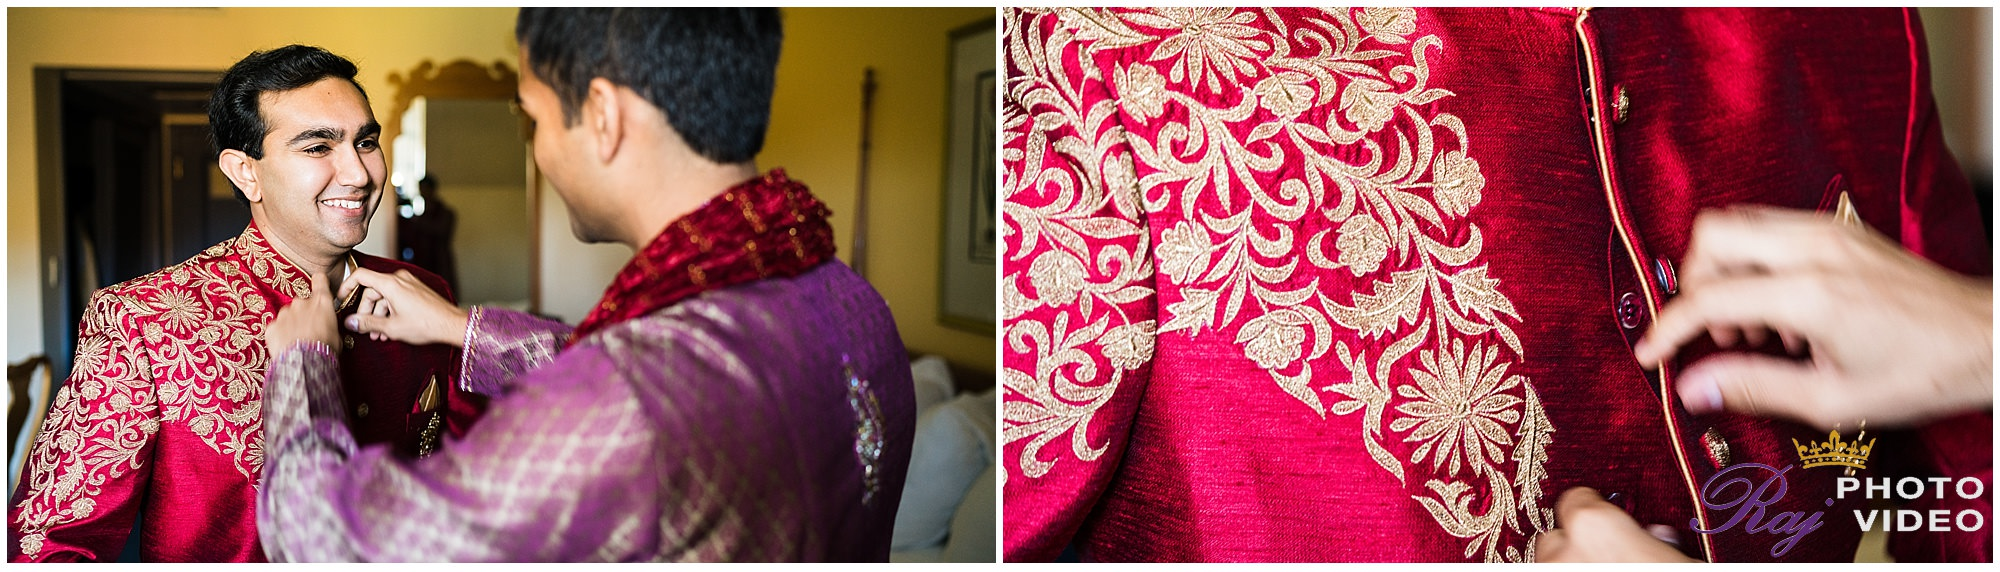 Founders-Inn-and-Spa-Virginia-Beach-VA-Indian-Wedding-Harini-Vivek-26.jpg